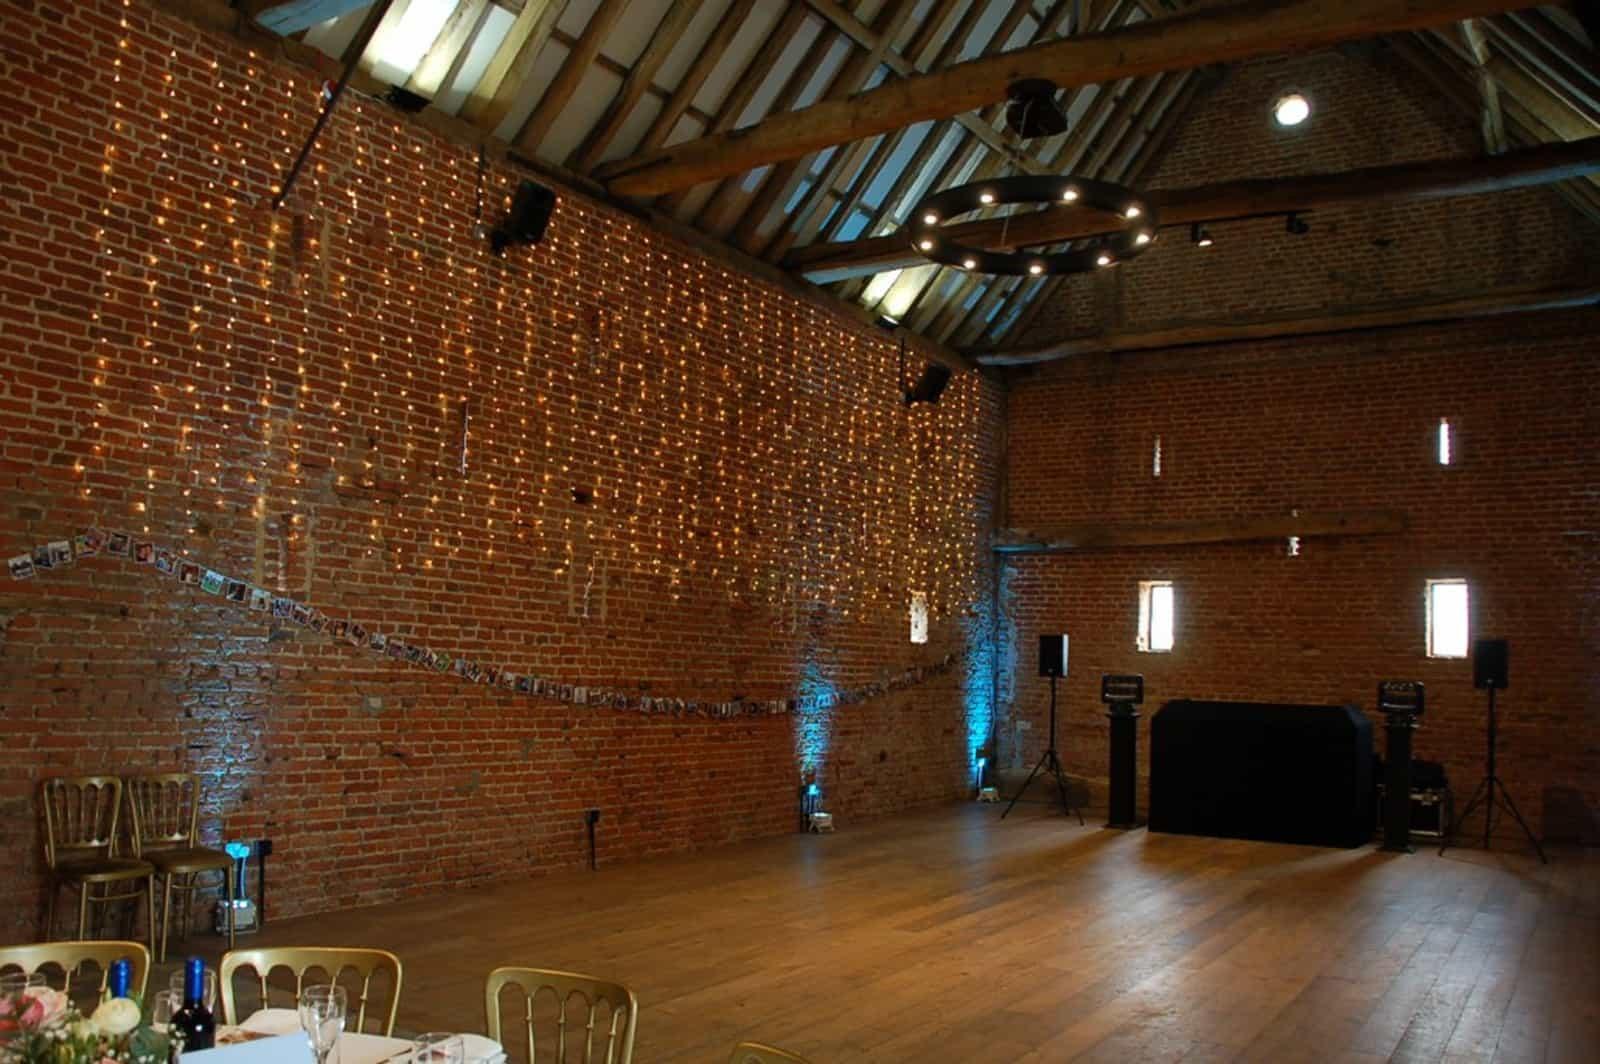 Wall of disco lights Copdock Hall